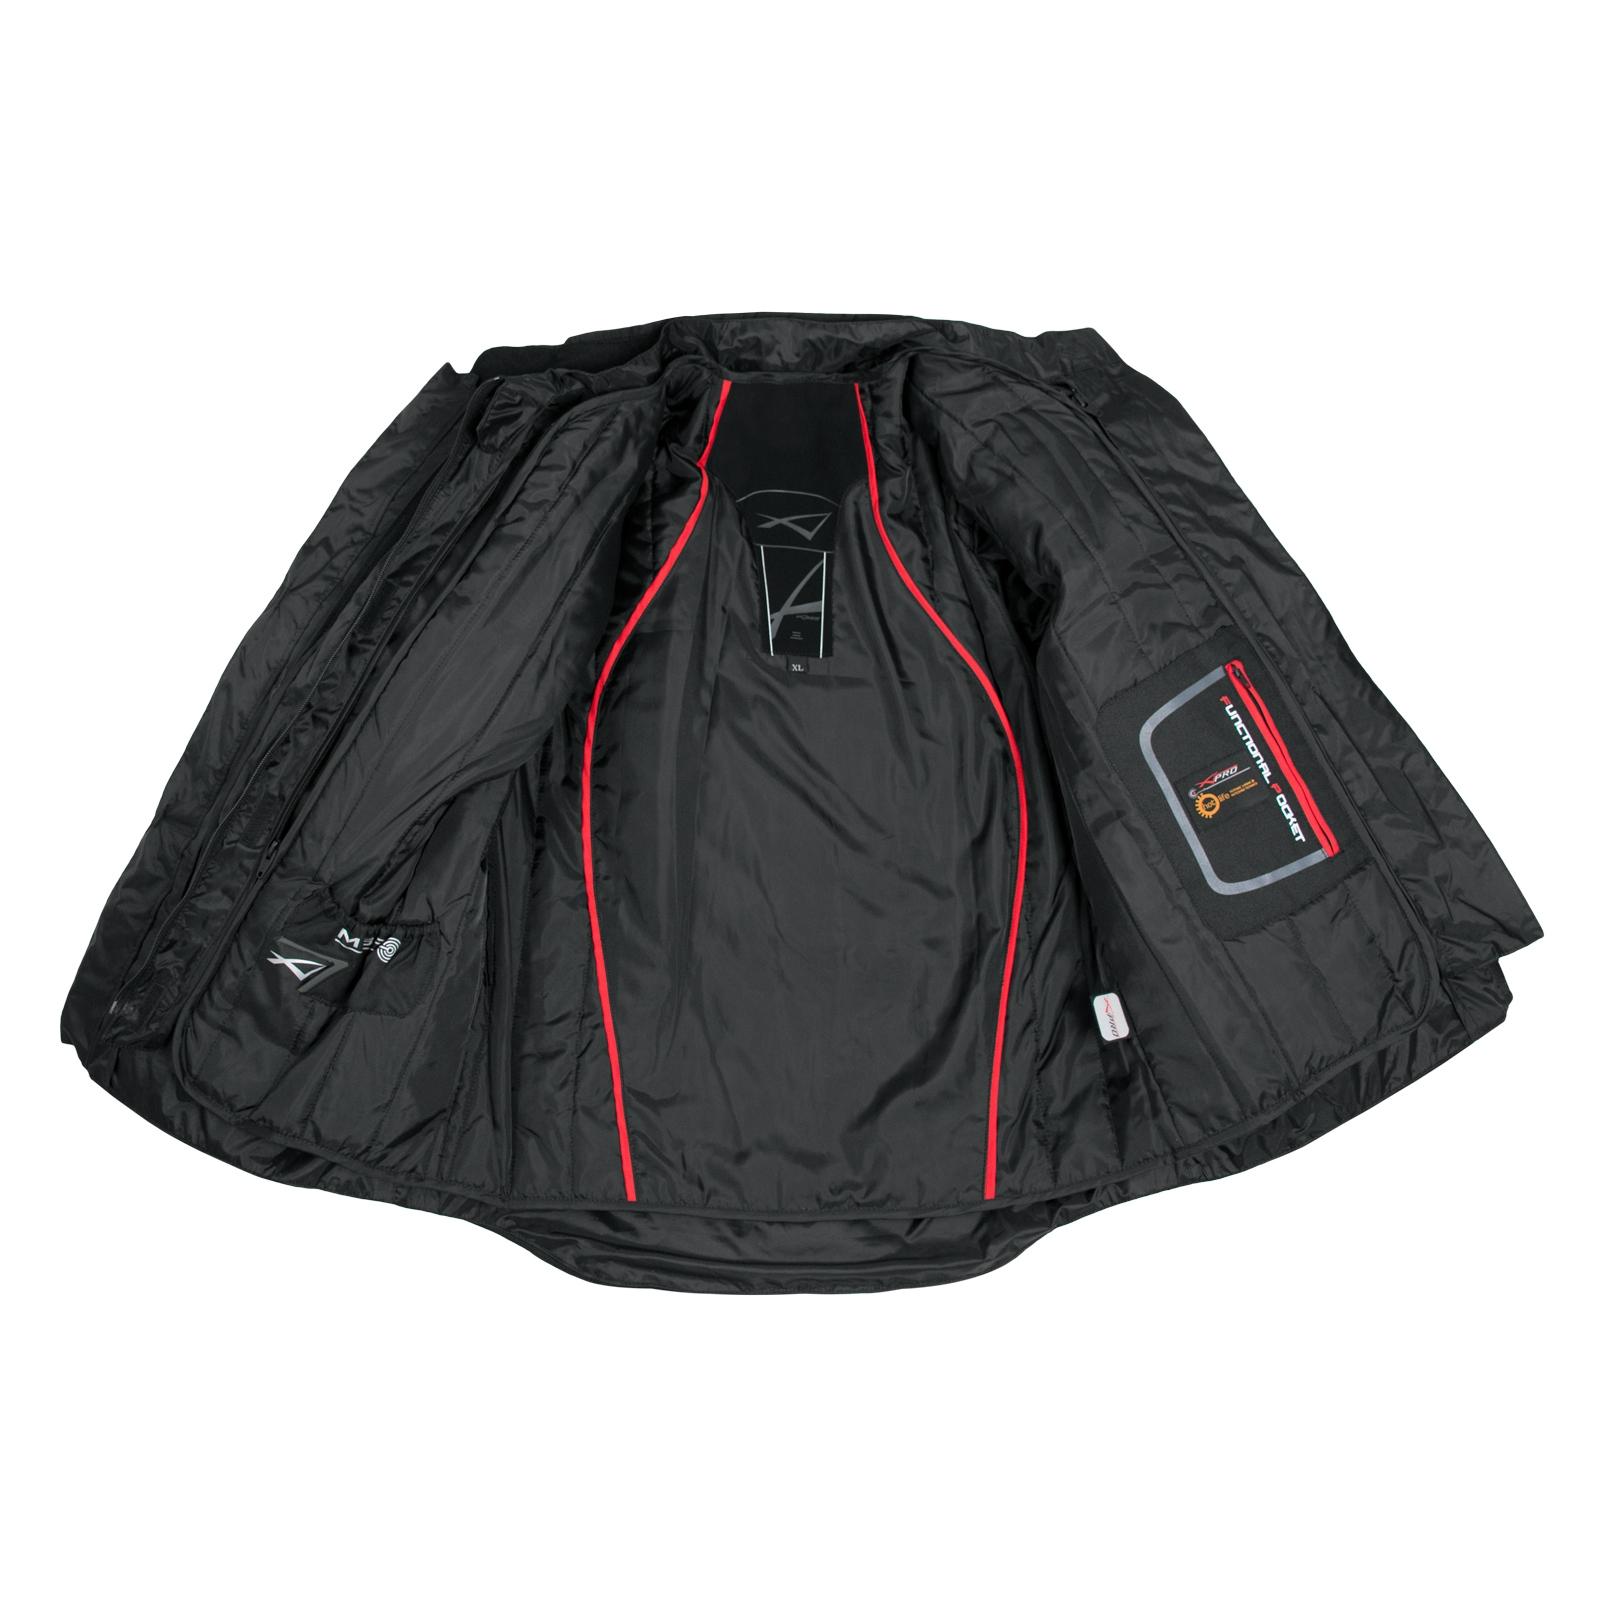 miniatuur 5 - Giacca Touring Moto Cordura Tessuto Protezioni CE Sfoderabile Impermeabile